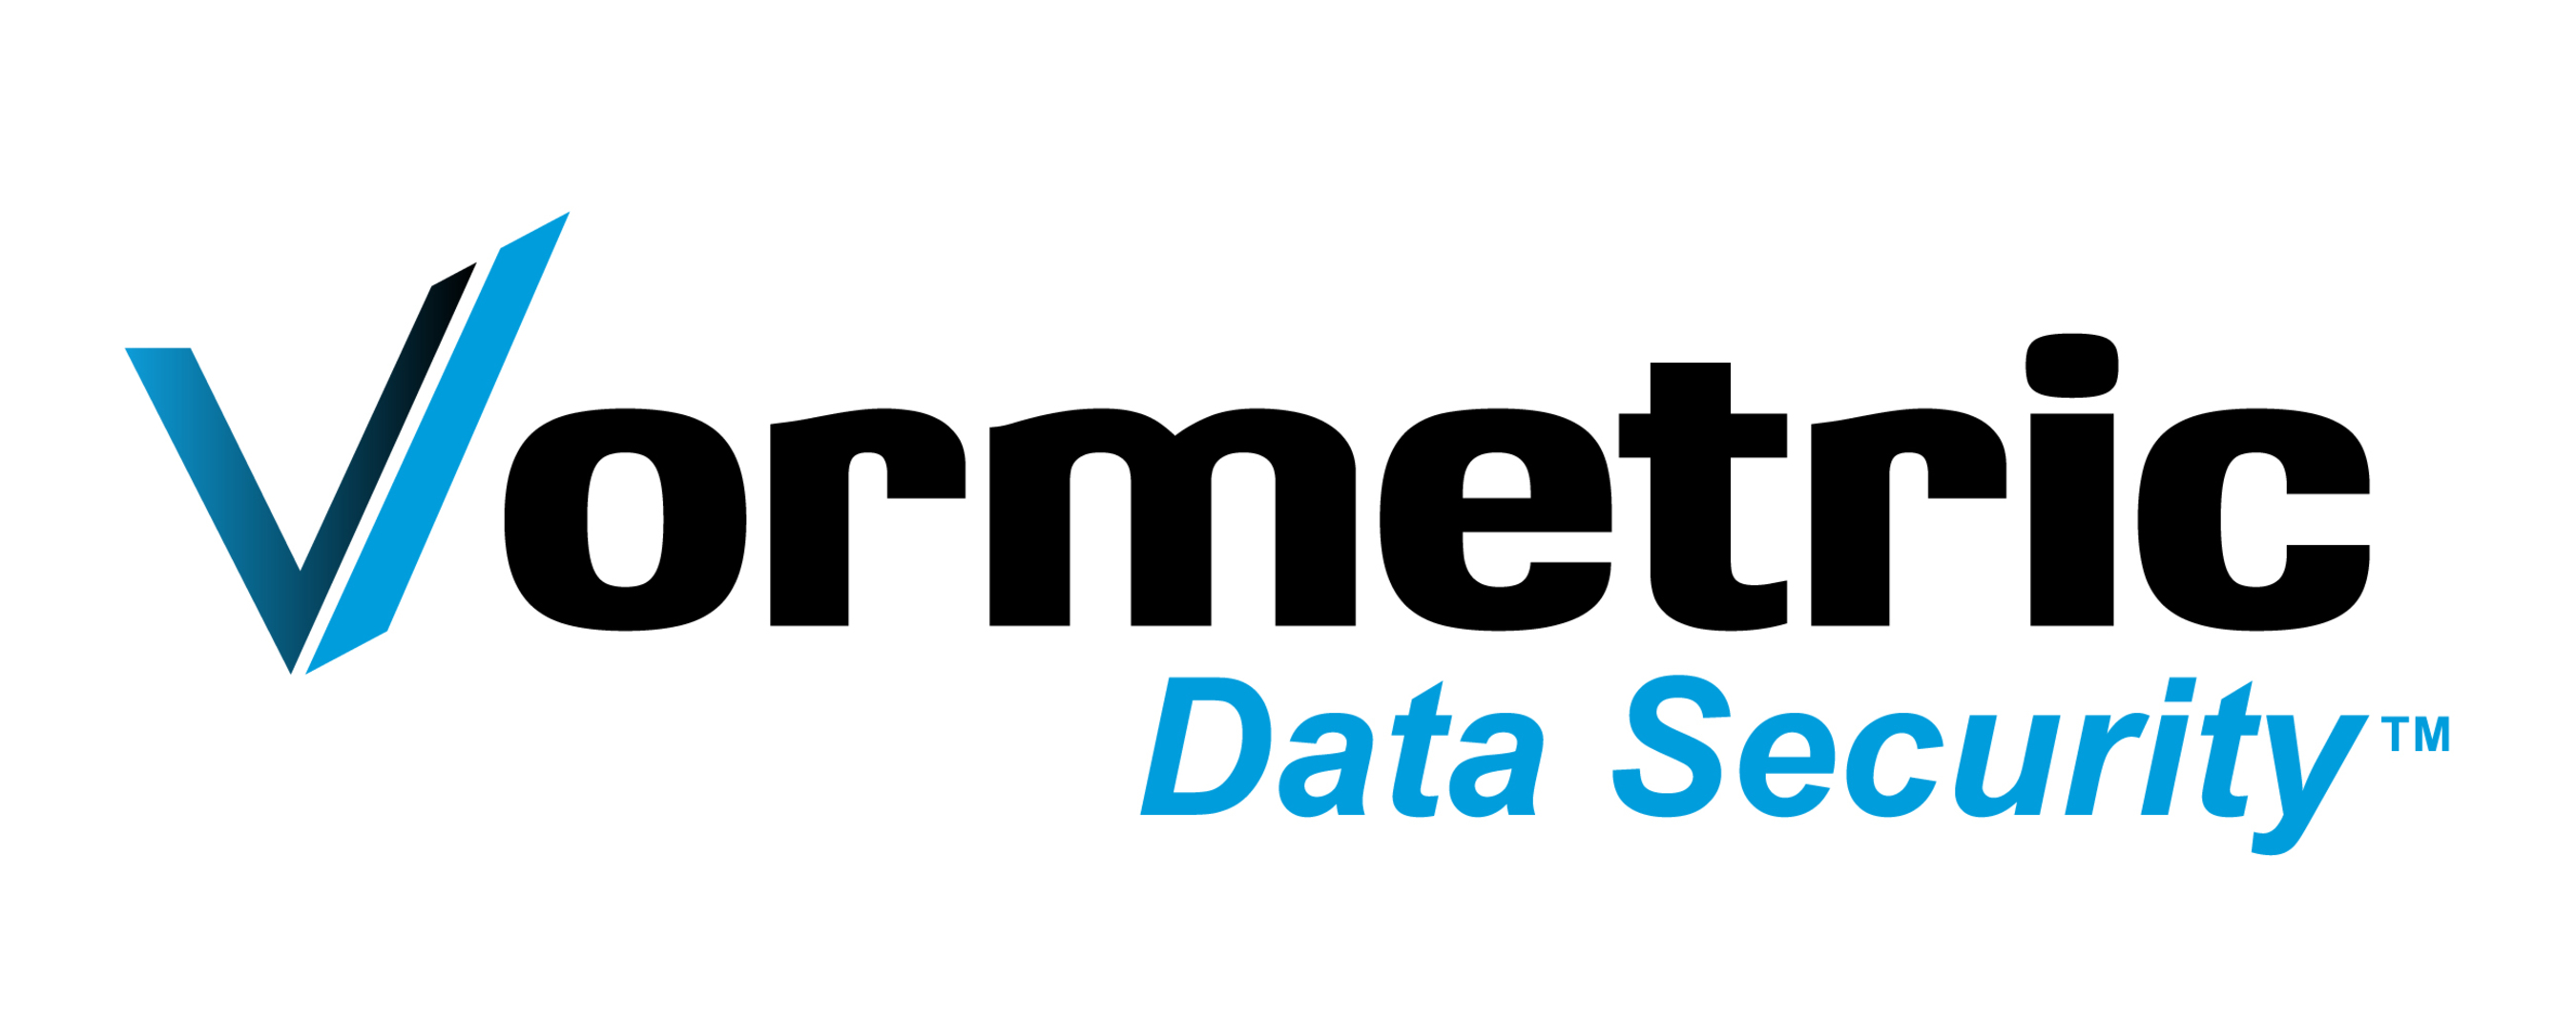 Vormetric's logo